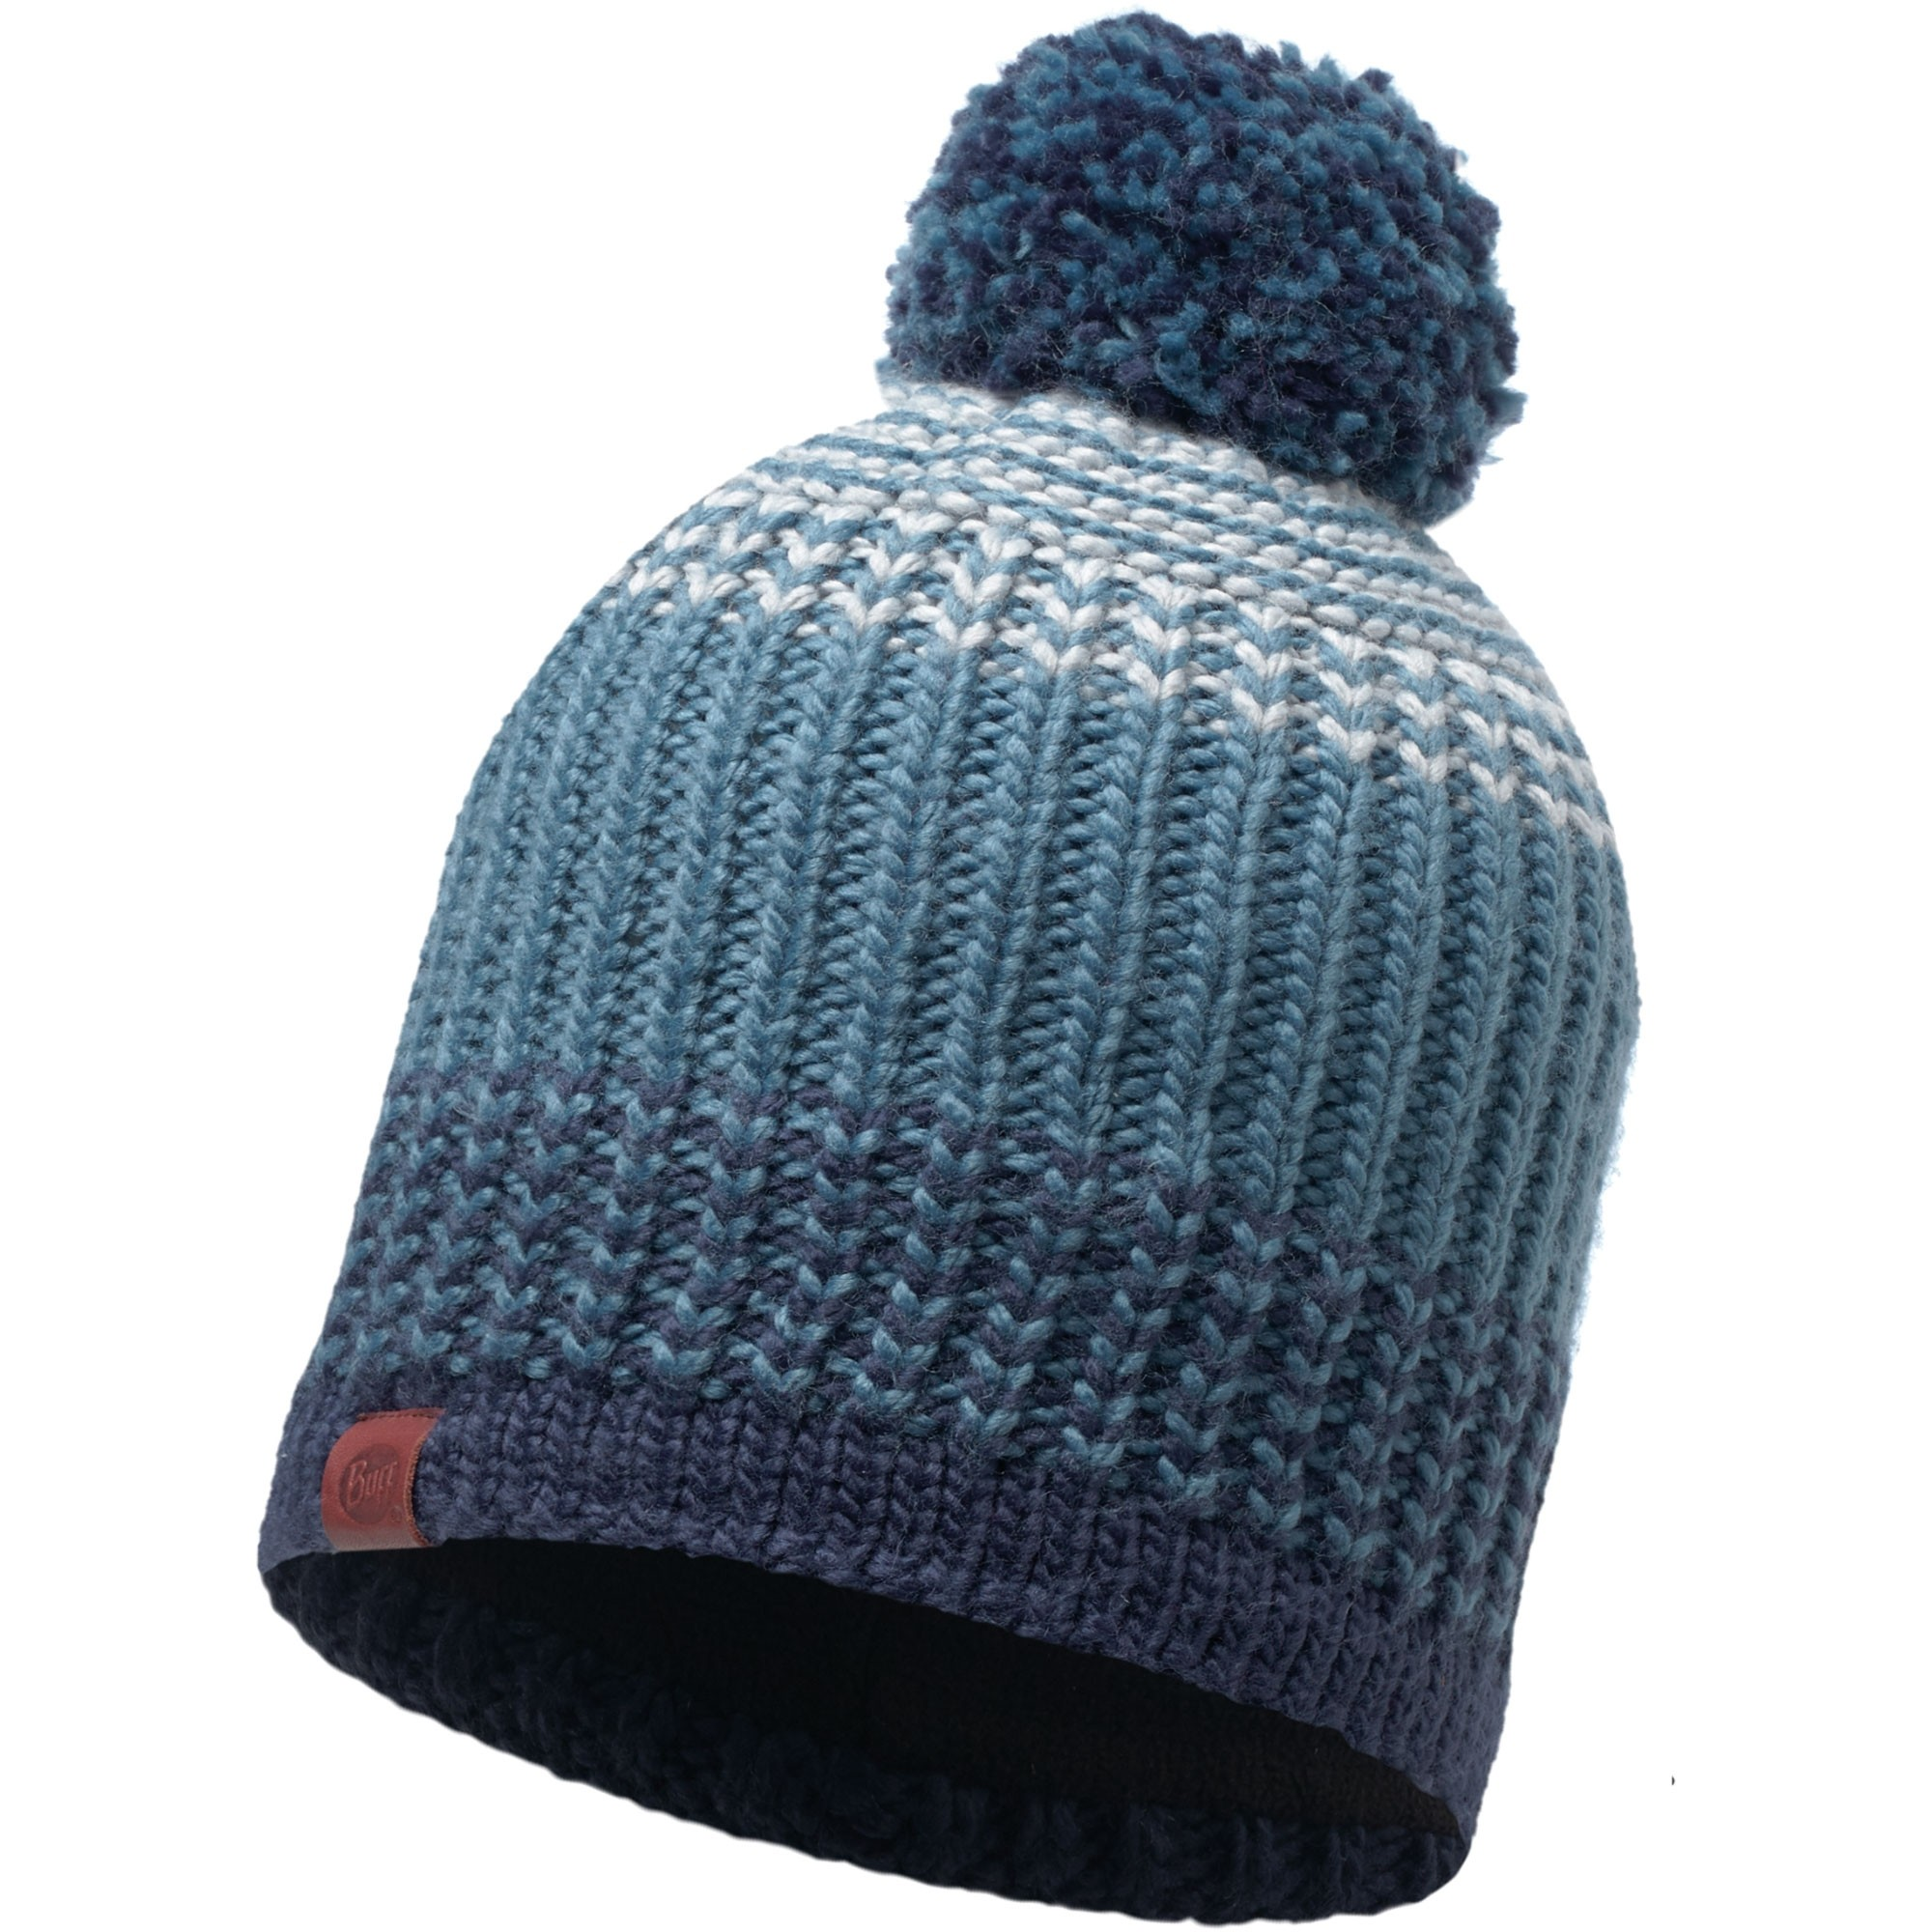 Buff Borae Knitted Hat - Mazarine Blue